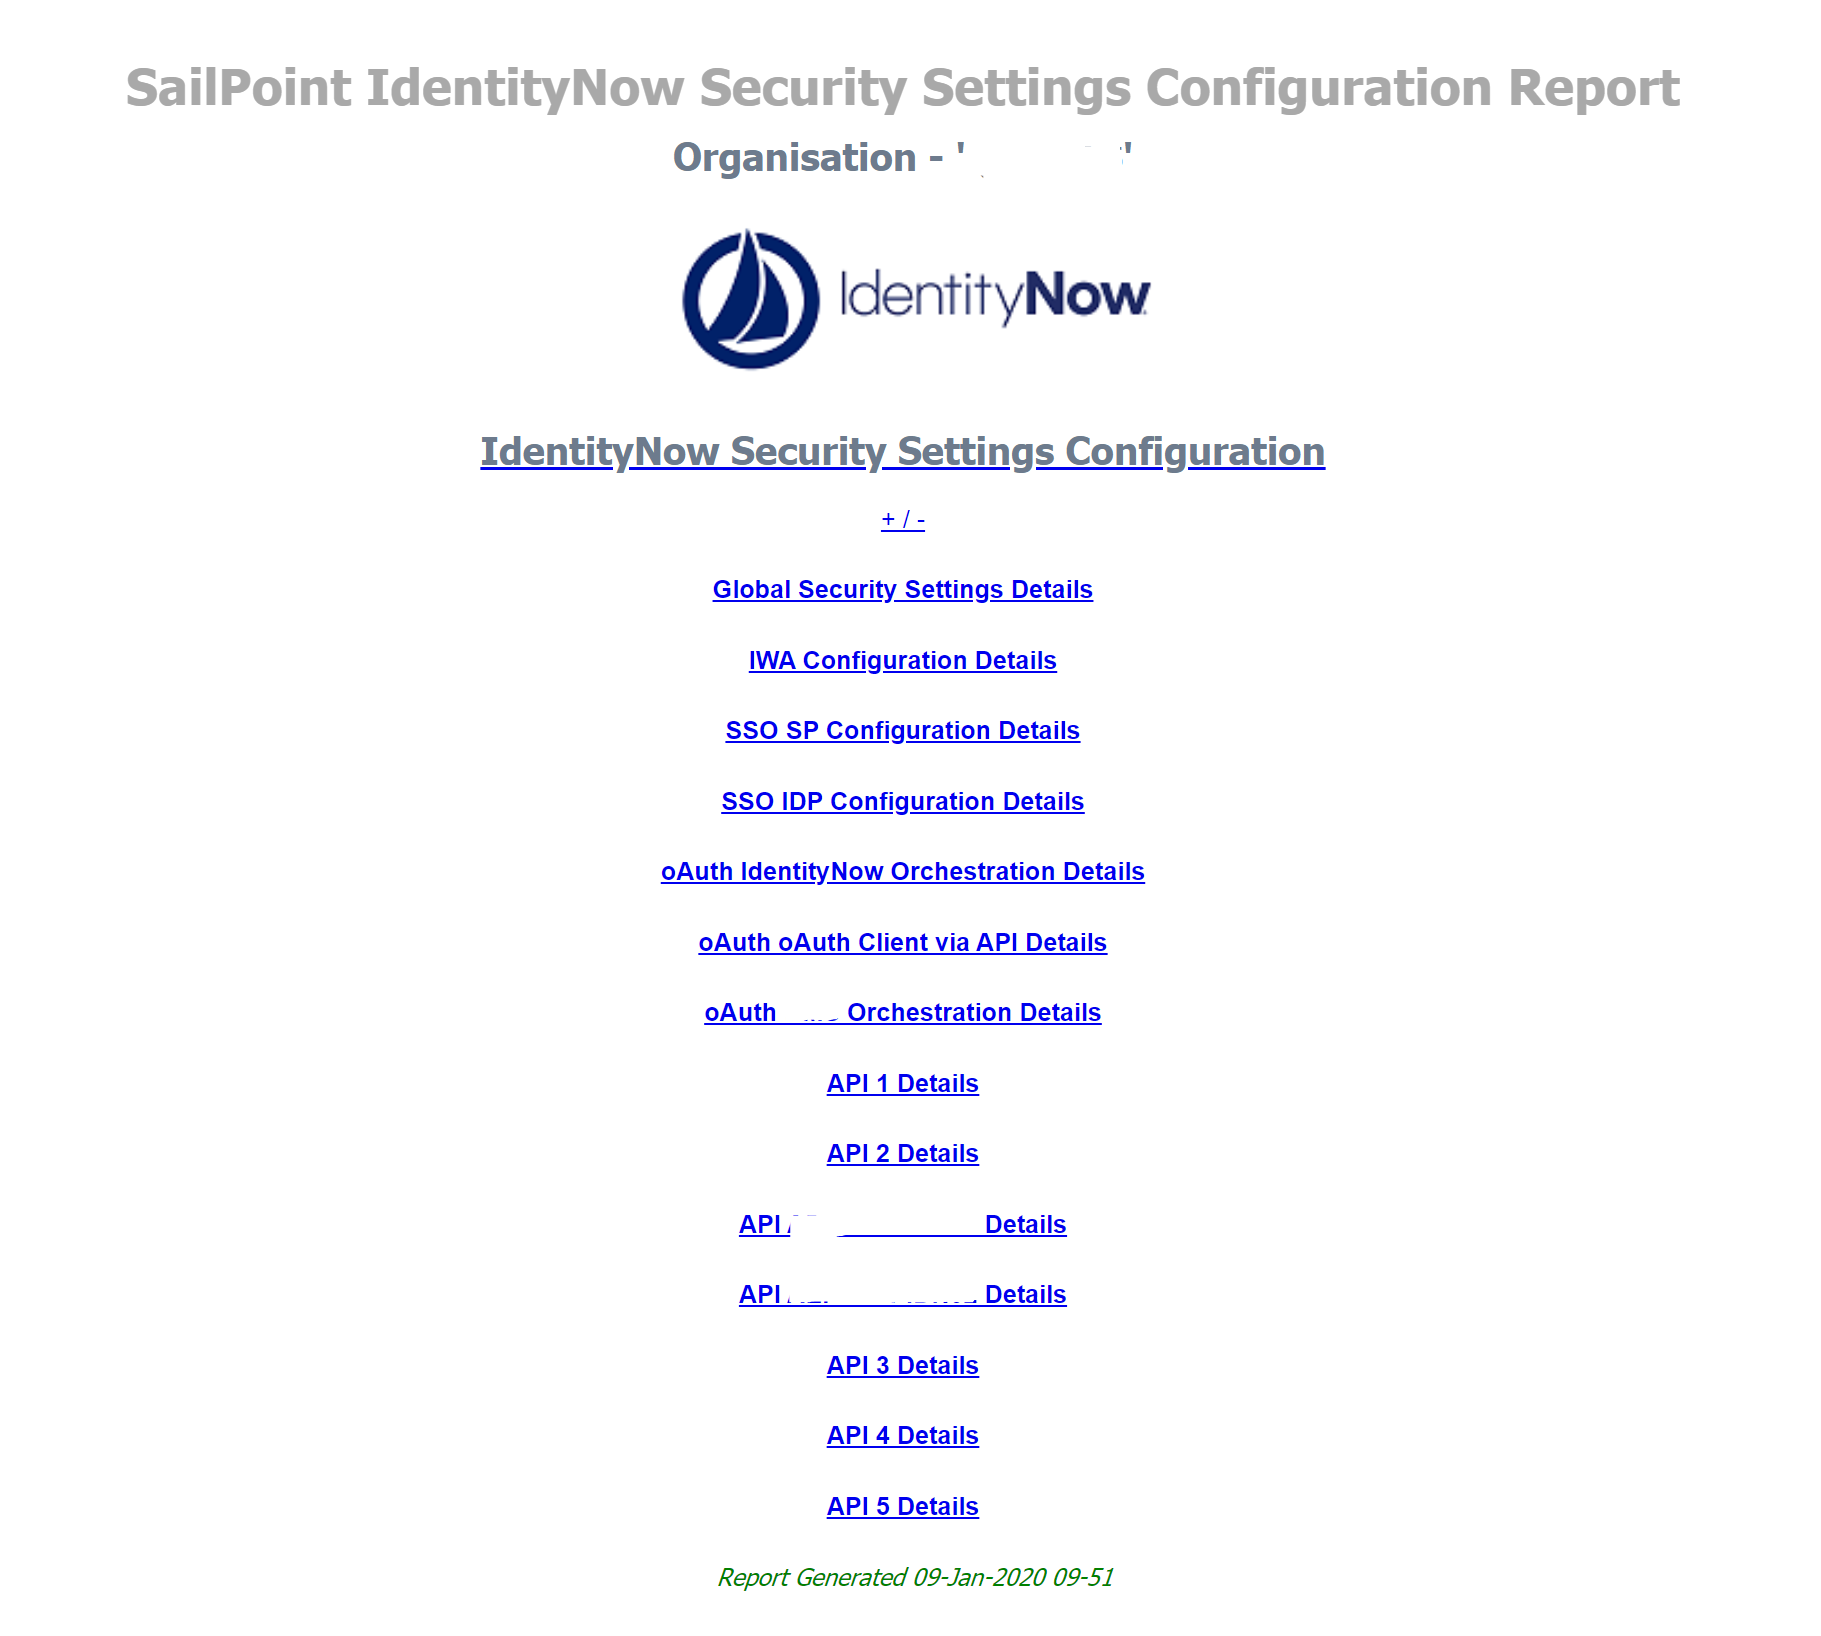 SailPoint IdentityNow Security Config Report